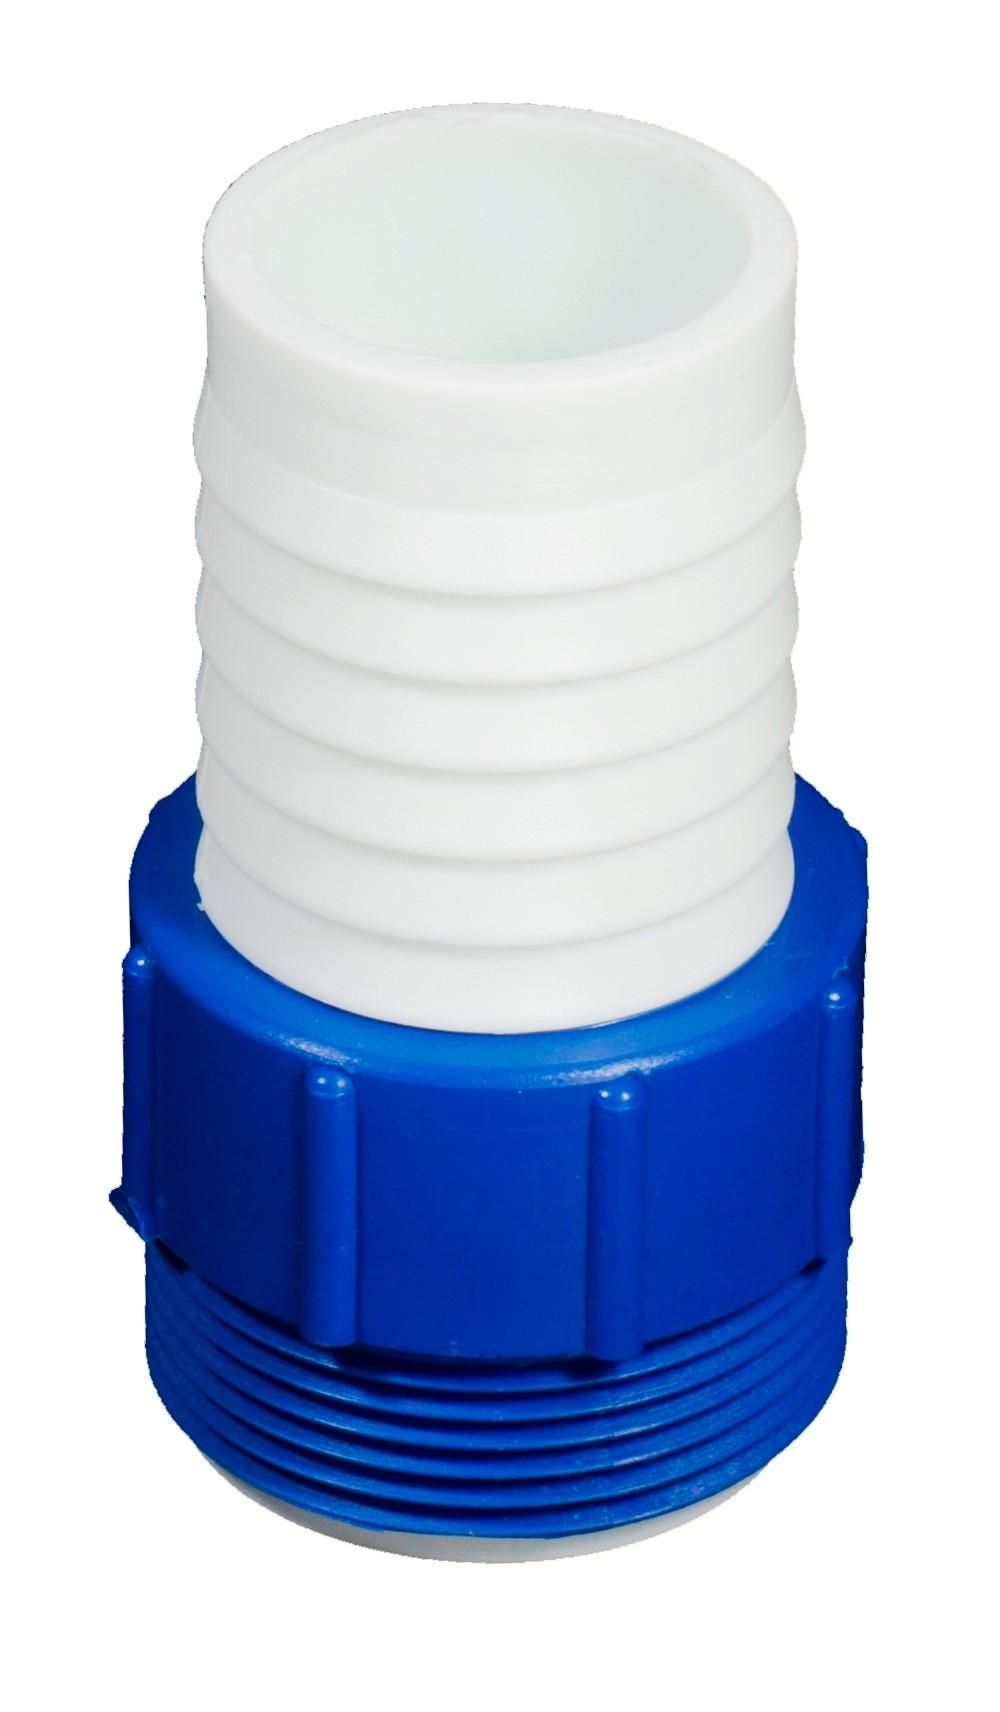 Kit de Limpeza de Piscina Fibra, Alvenaria e Vinil 7 Peças - Sol e Água